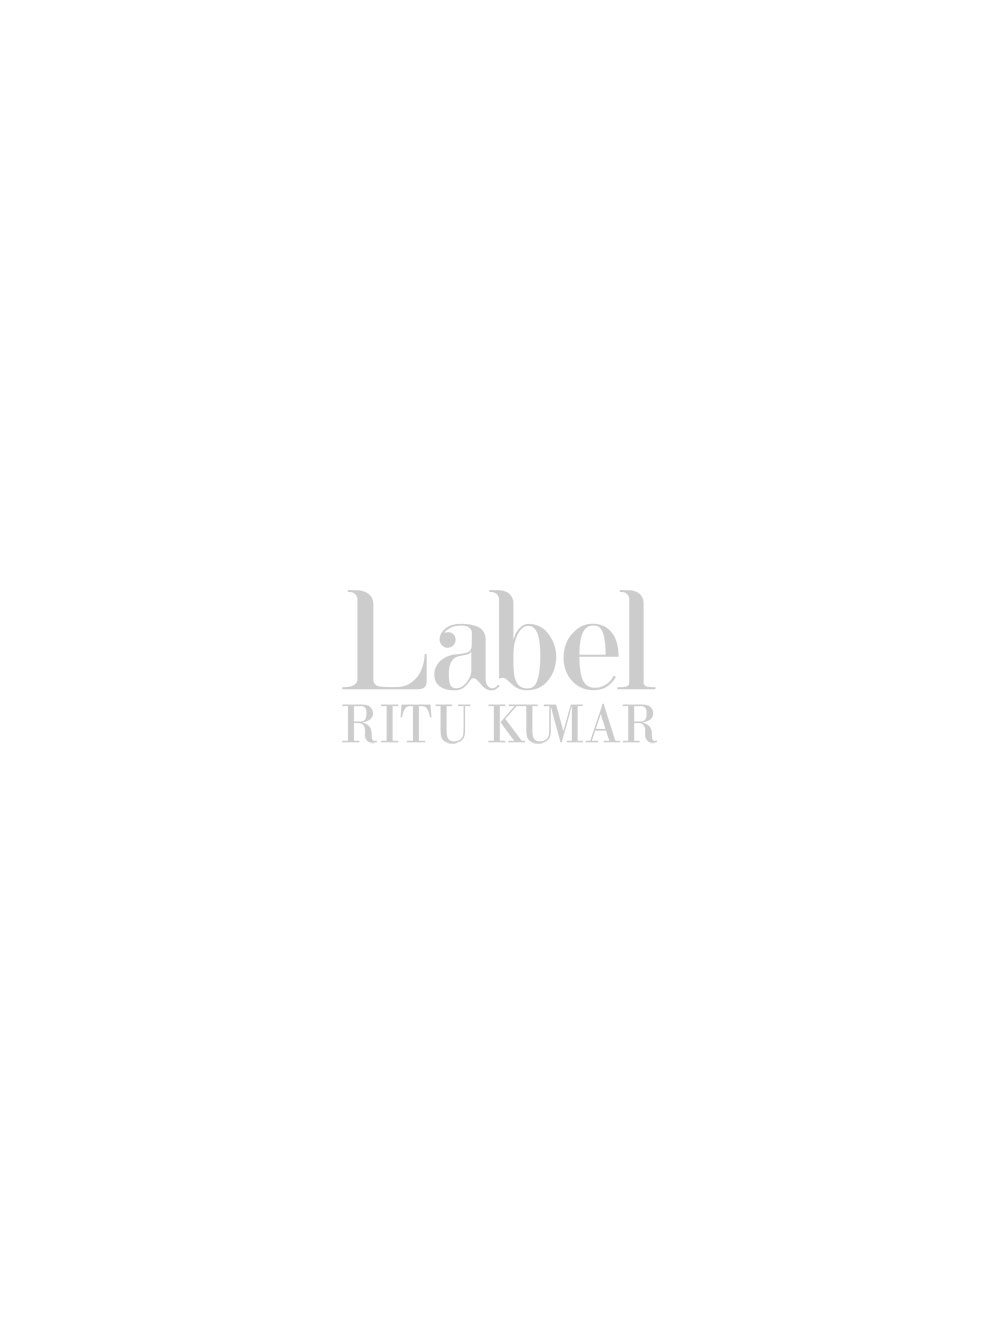 Turquoise Flared Short Top By Label Ritu Kumar